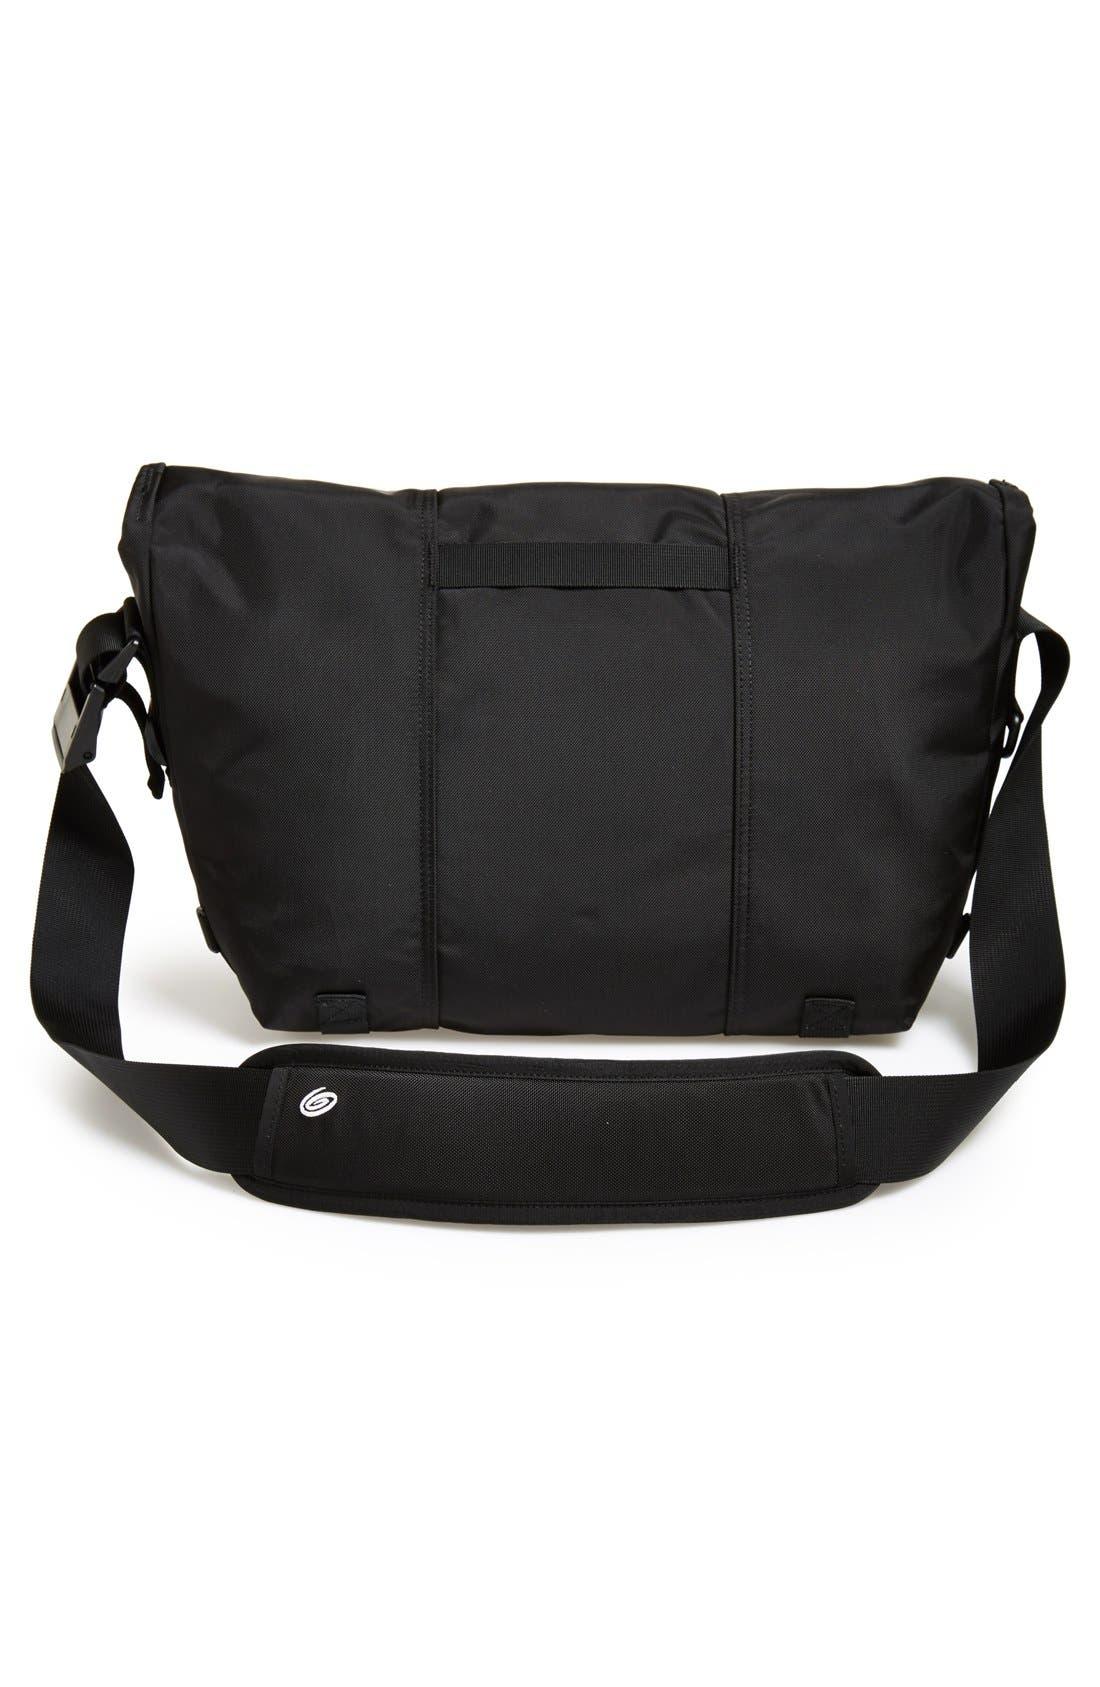 Medium Messenger Bag,                             Alternate thumbnail 5, color,                             001